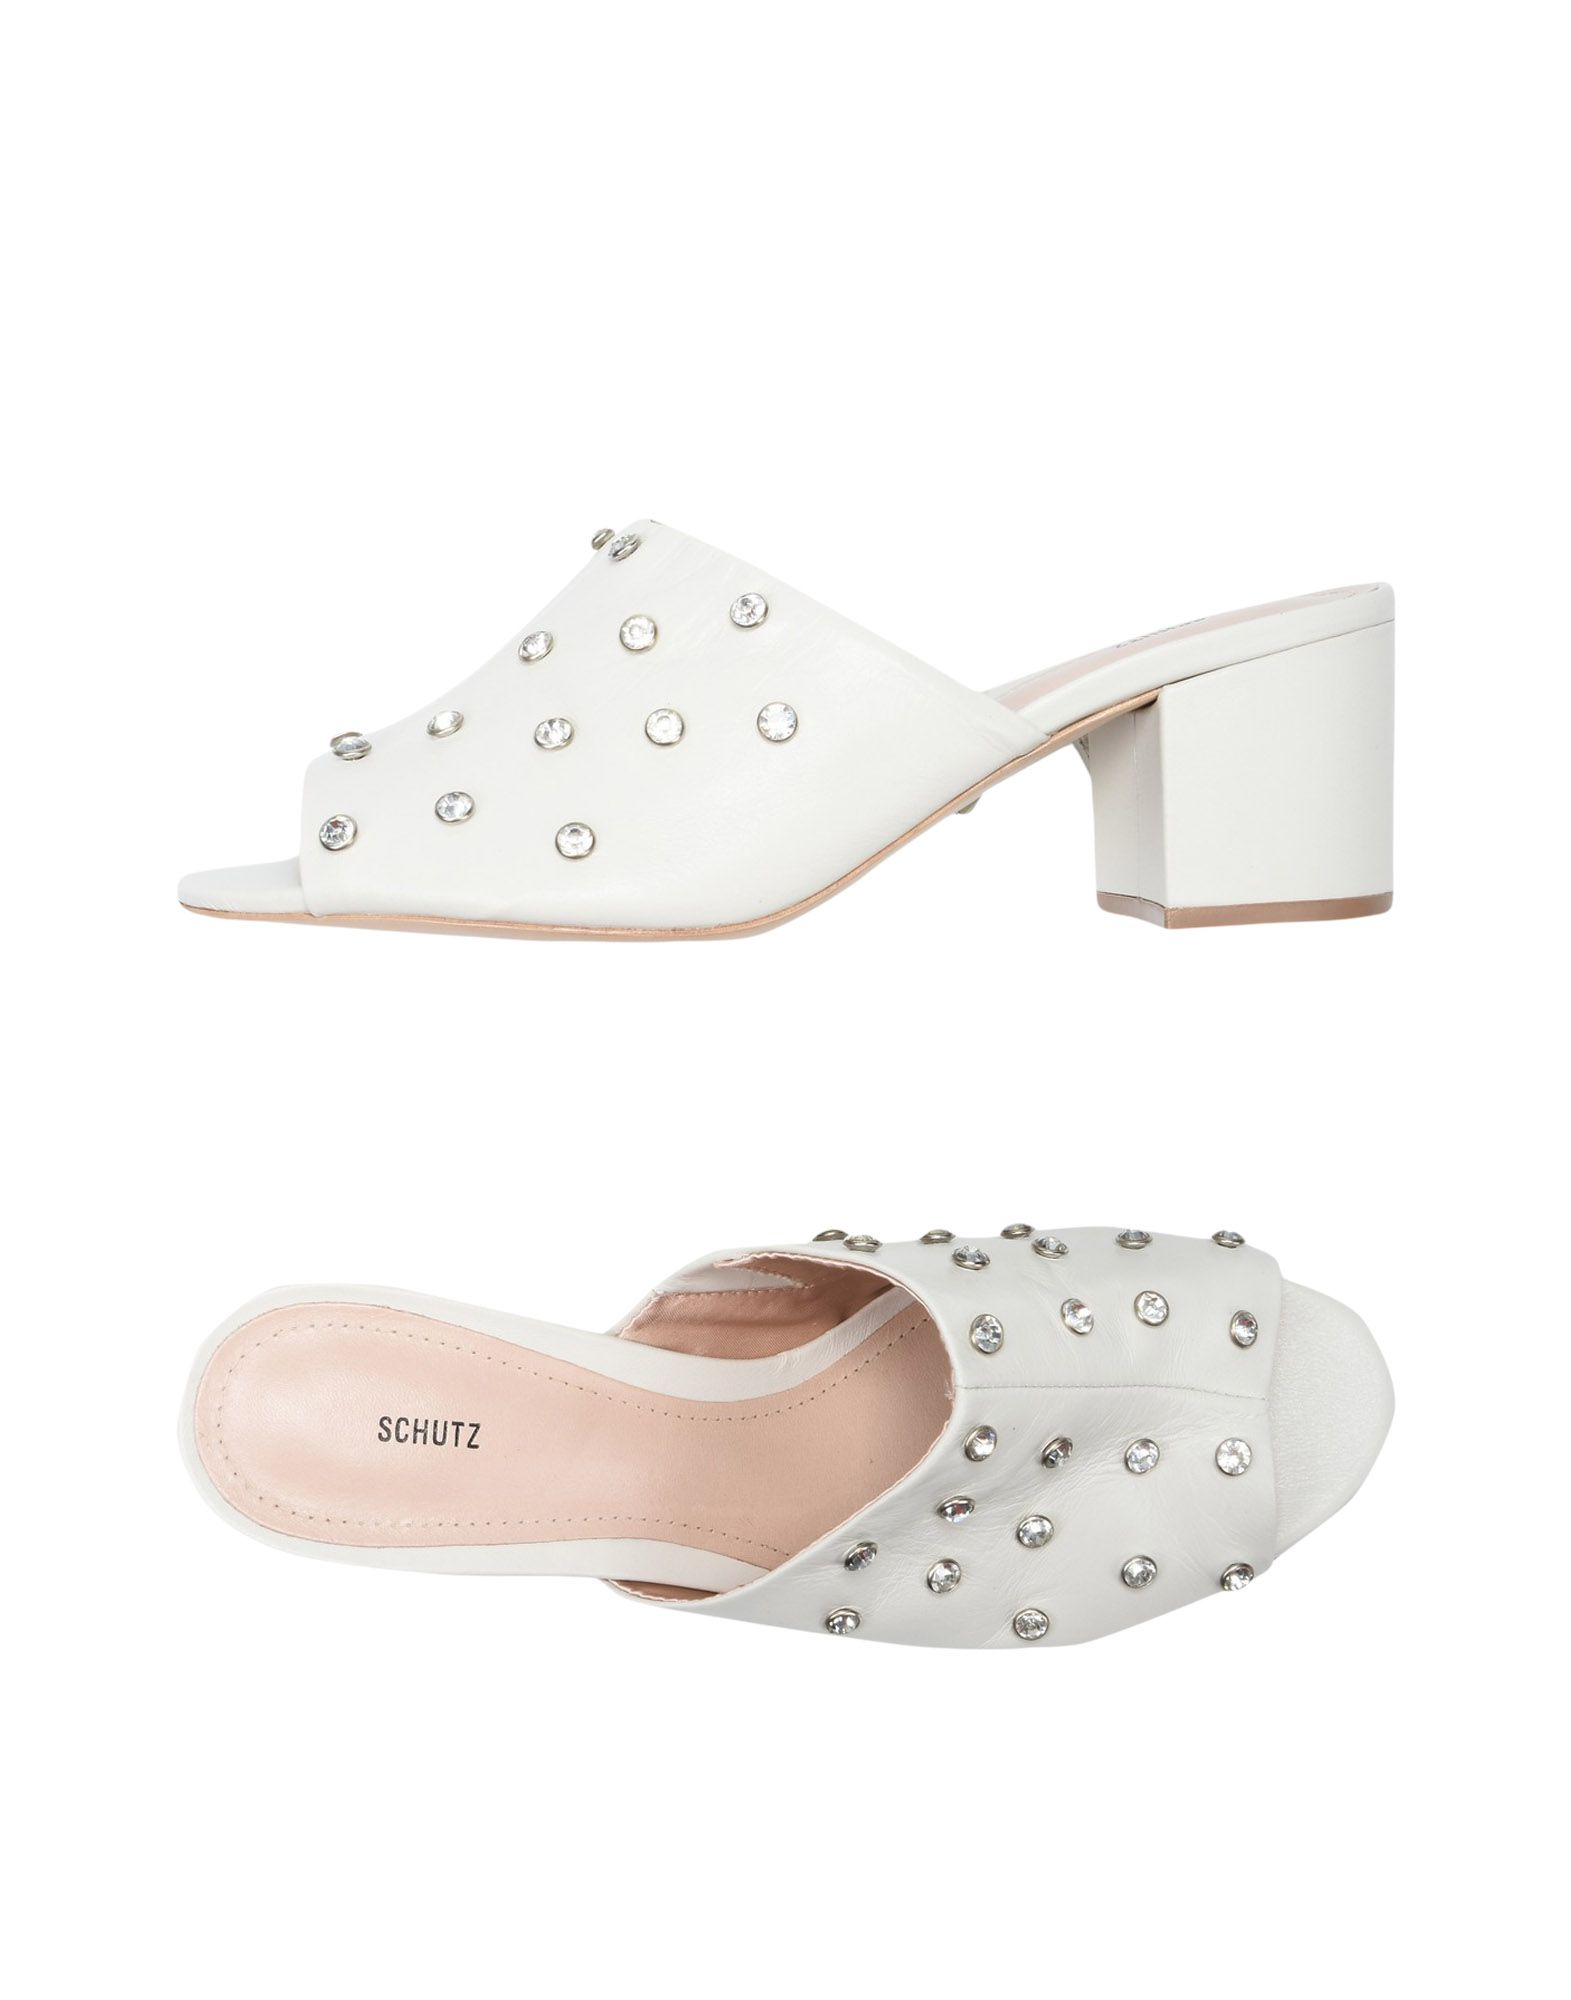 Schutz Sandalen Damen  11483239WT Gute Qualität beliebte Schuhe